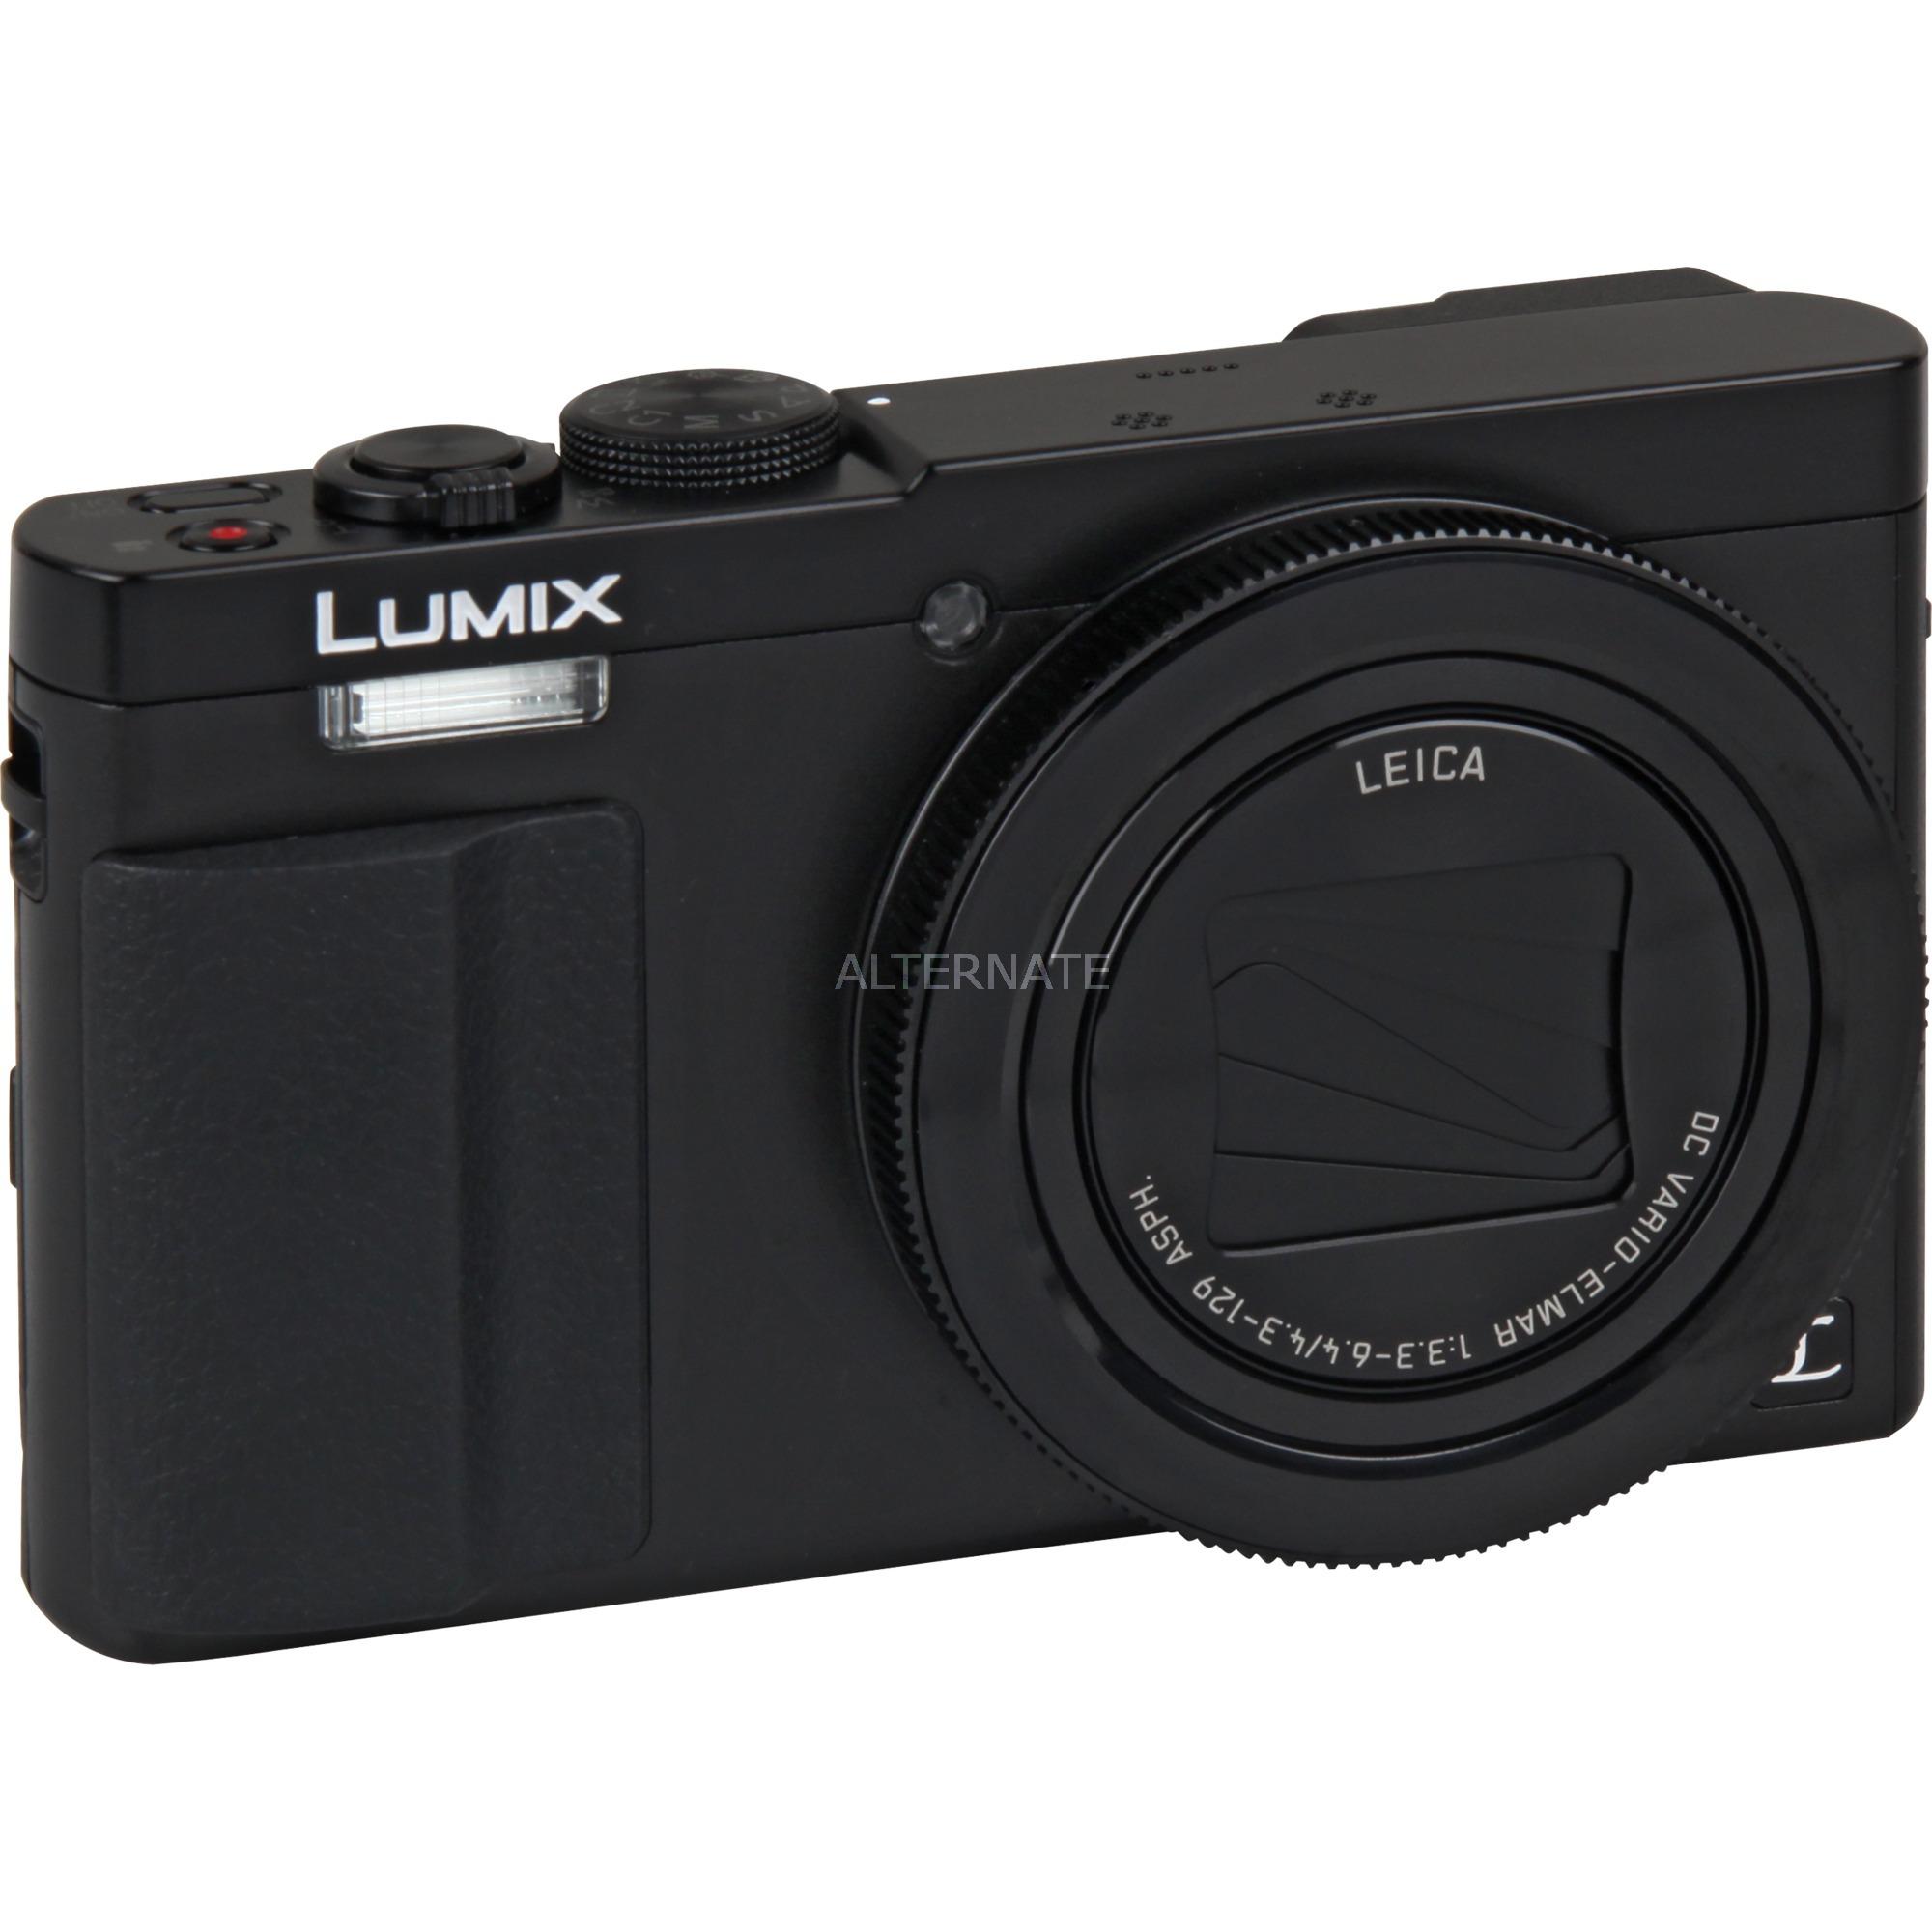 Lumix DMC-TZ71 Appareil-photo compact 12.1MP 1/2.3